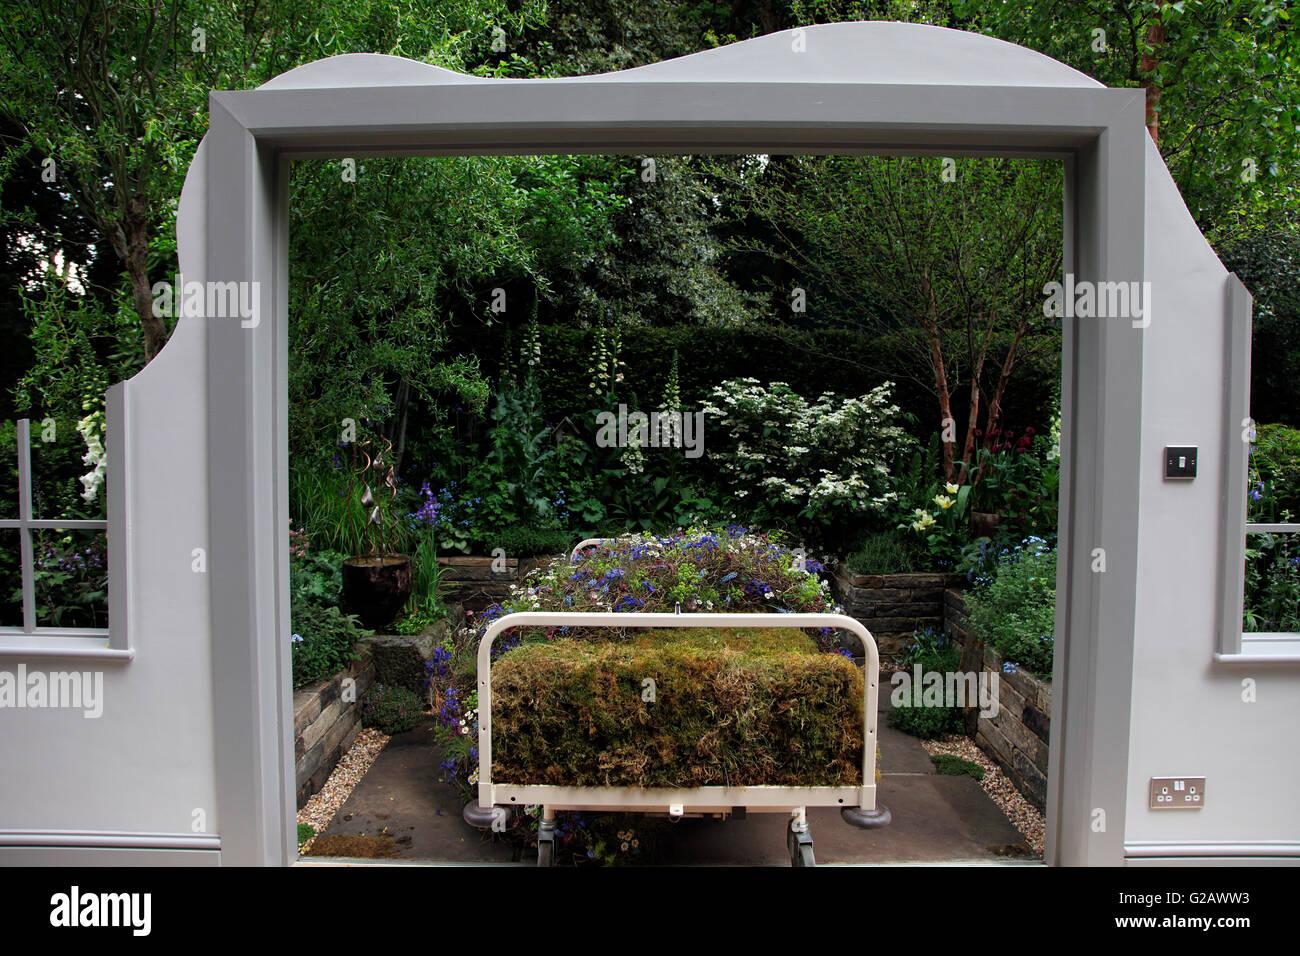 The Garden Bed, Artisan Garden, RHS Chelsea 2016 - Stock Image